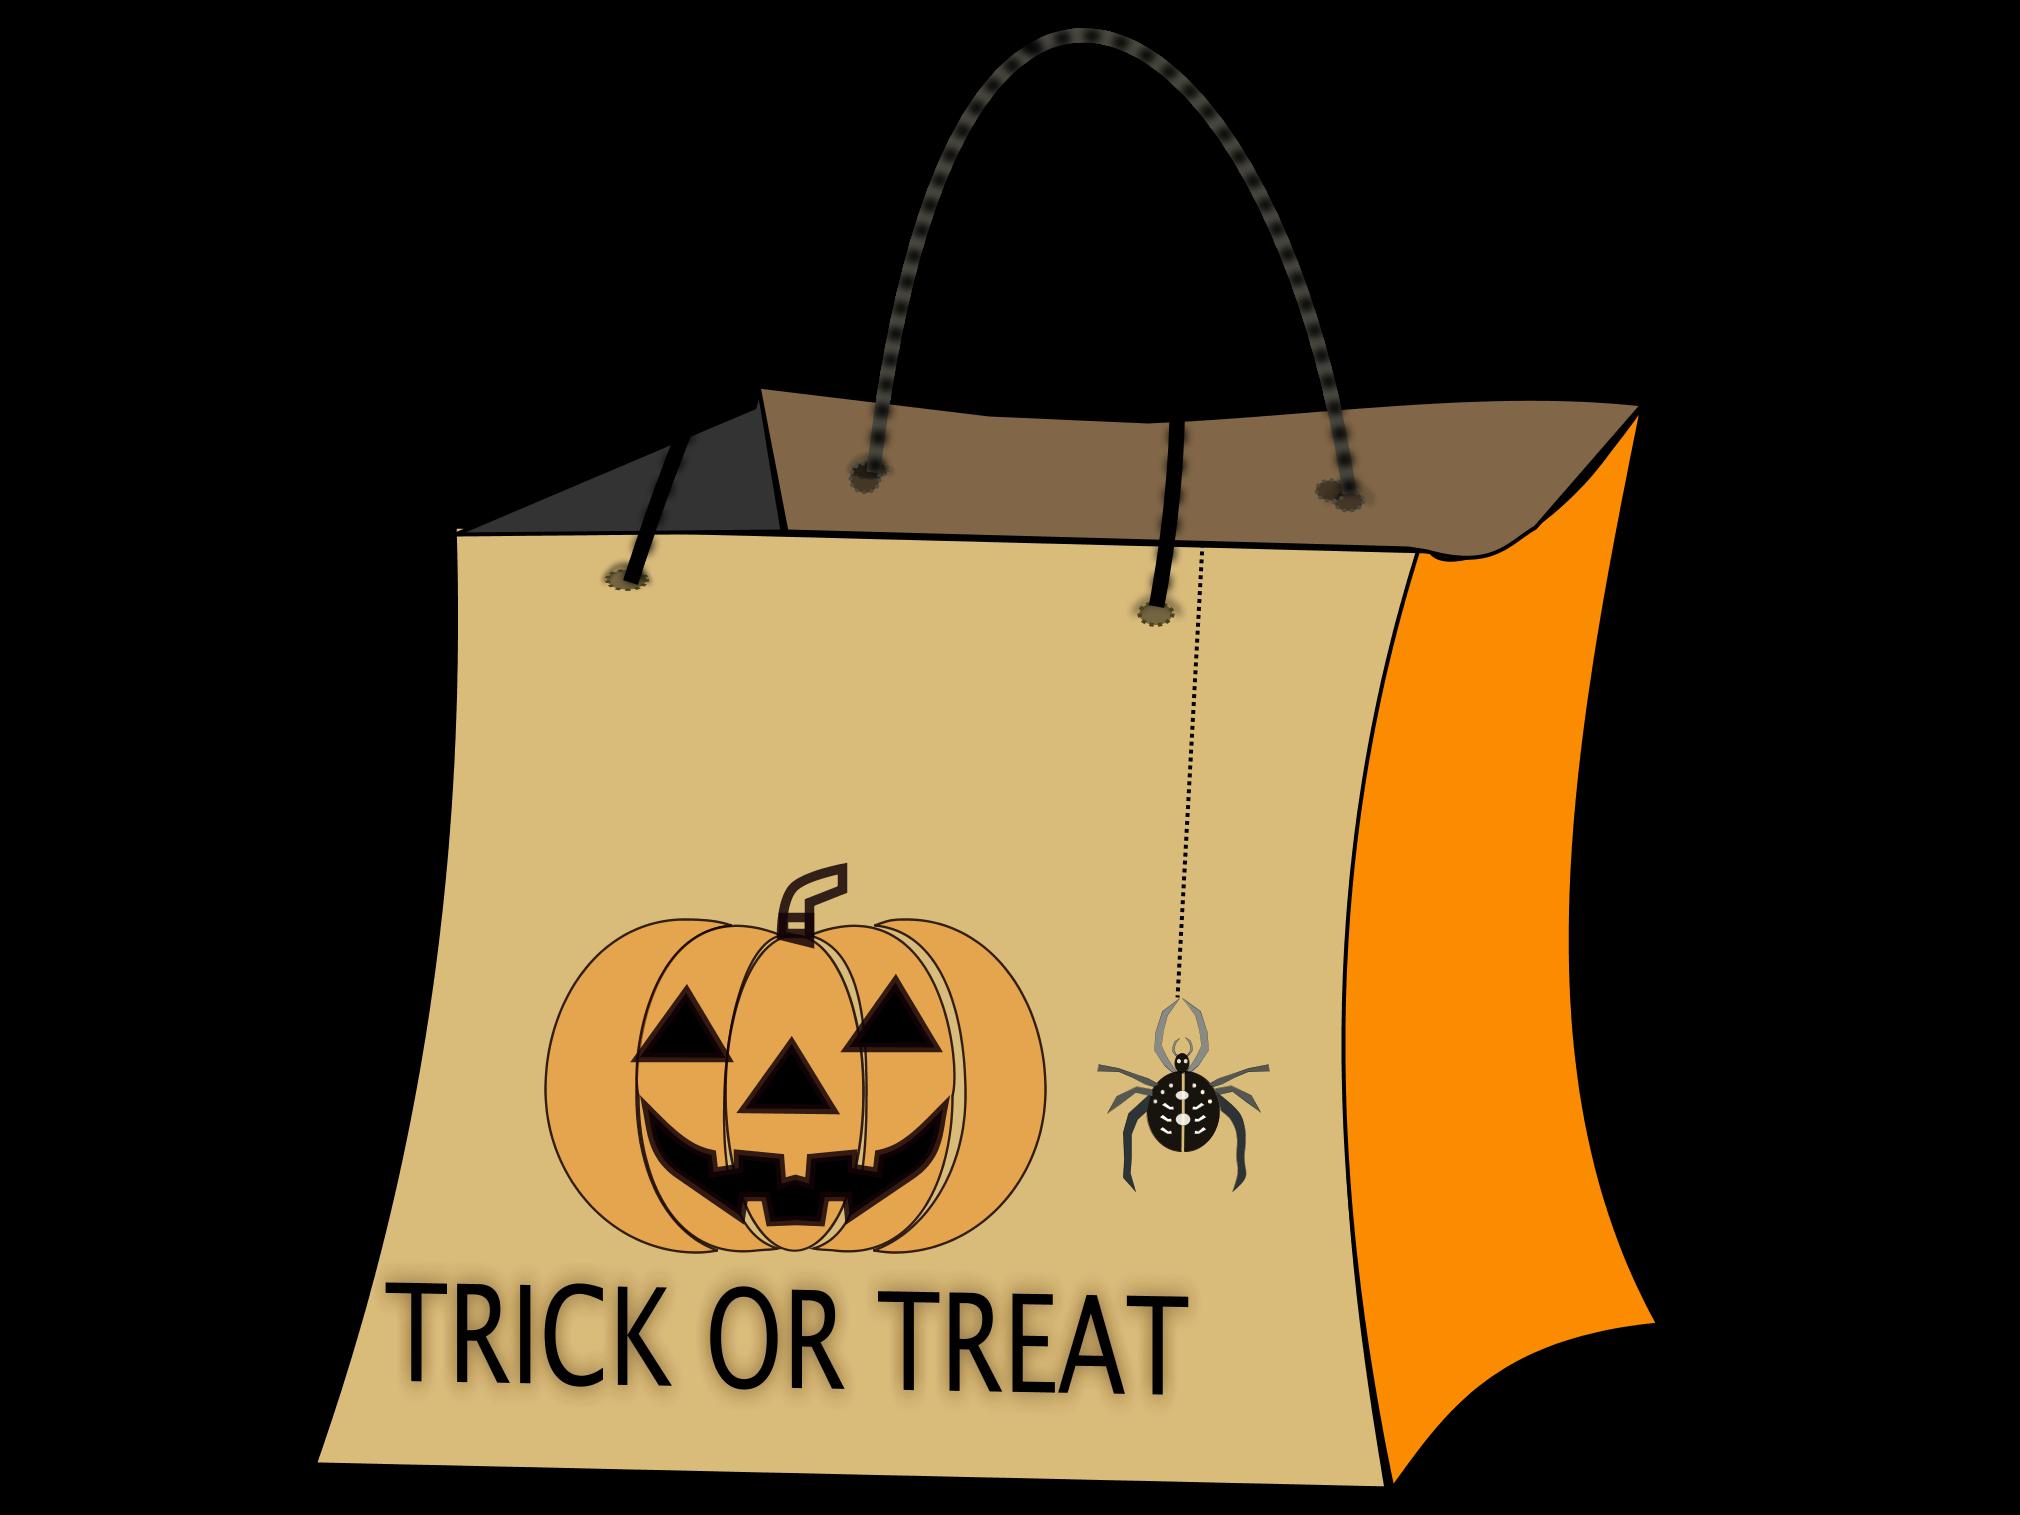 Luggage clipart pile. Halloween bag clip art